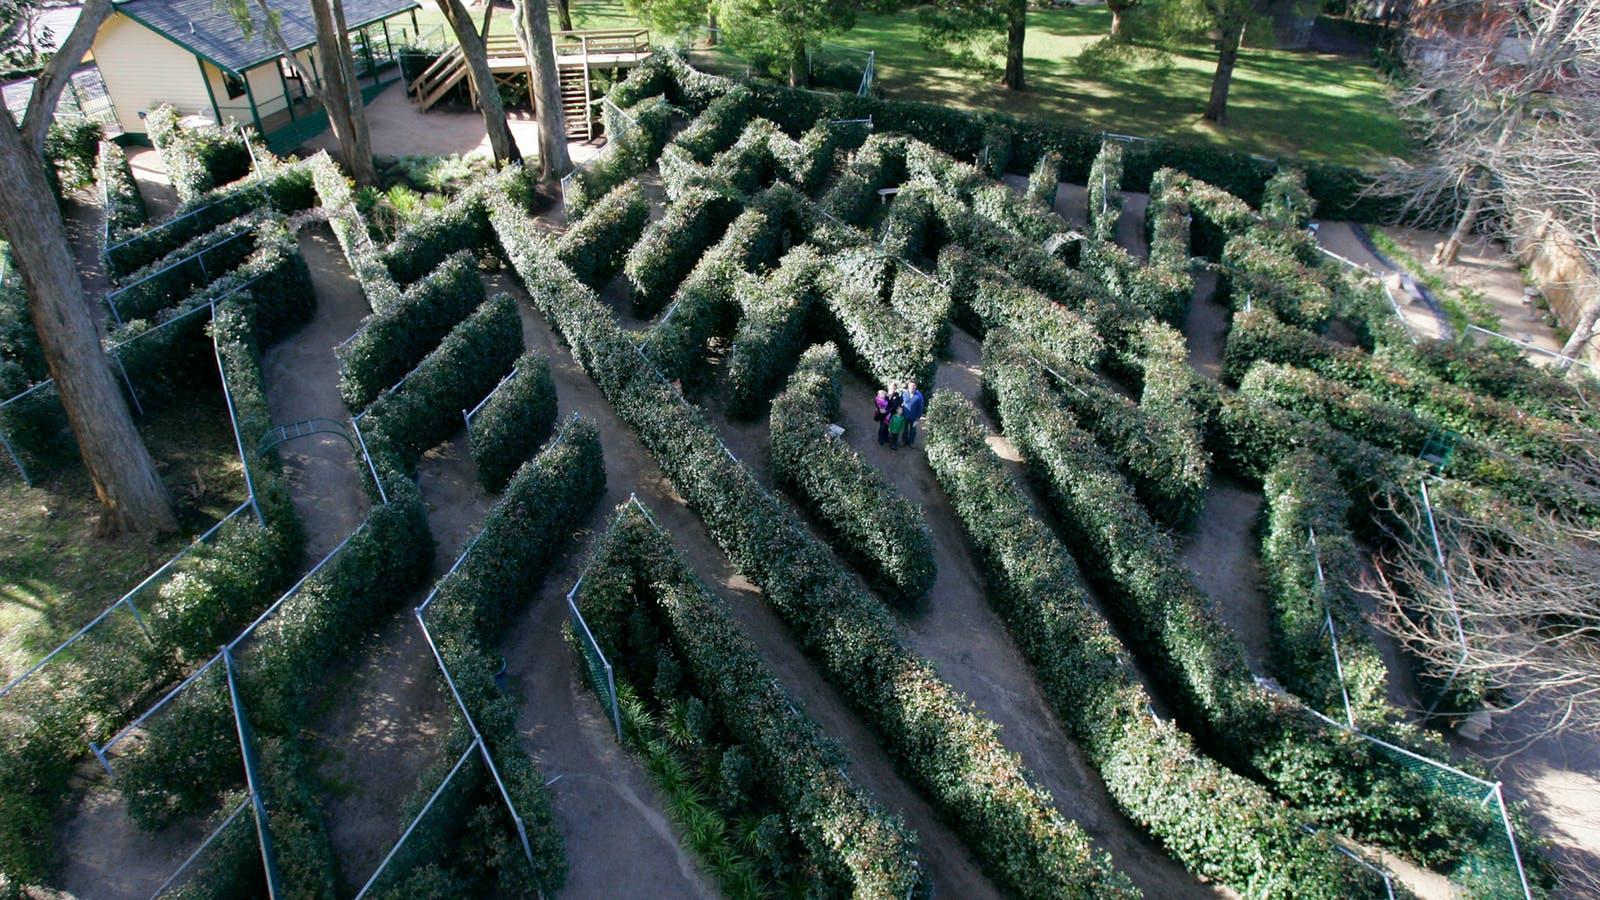 SkyHigh's Maze